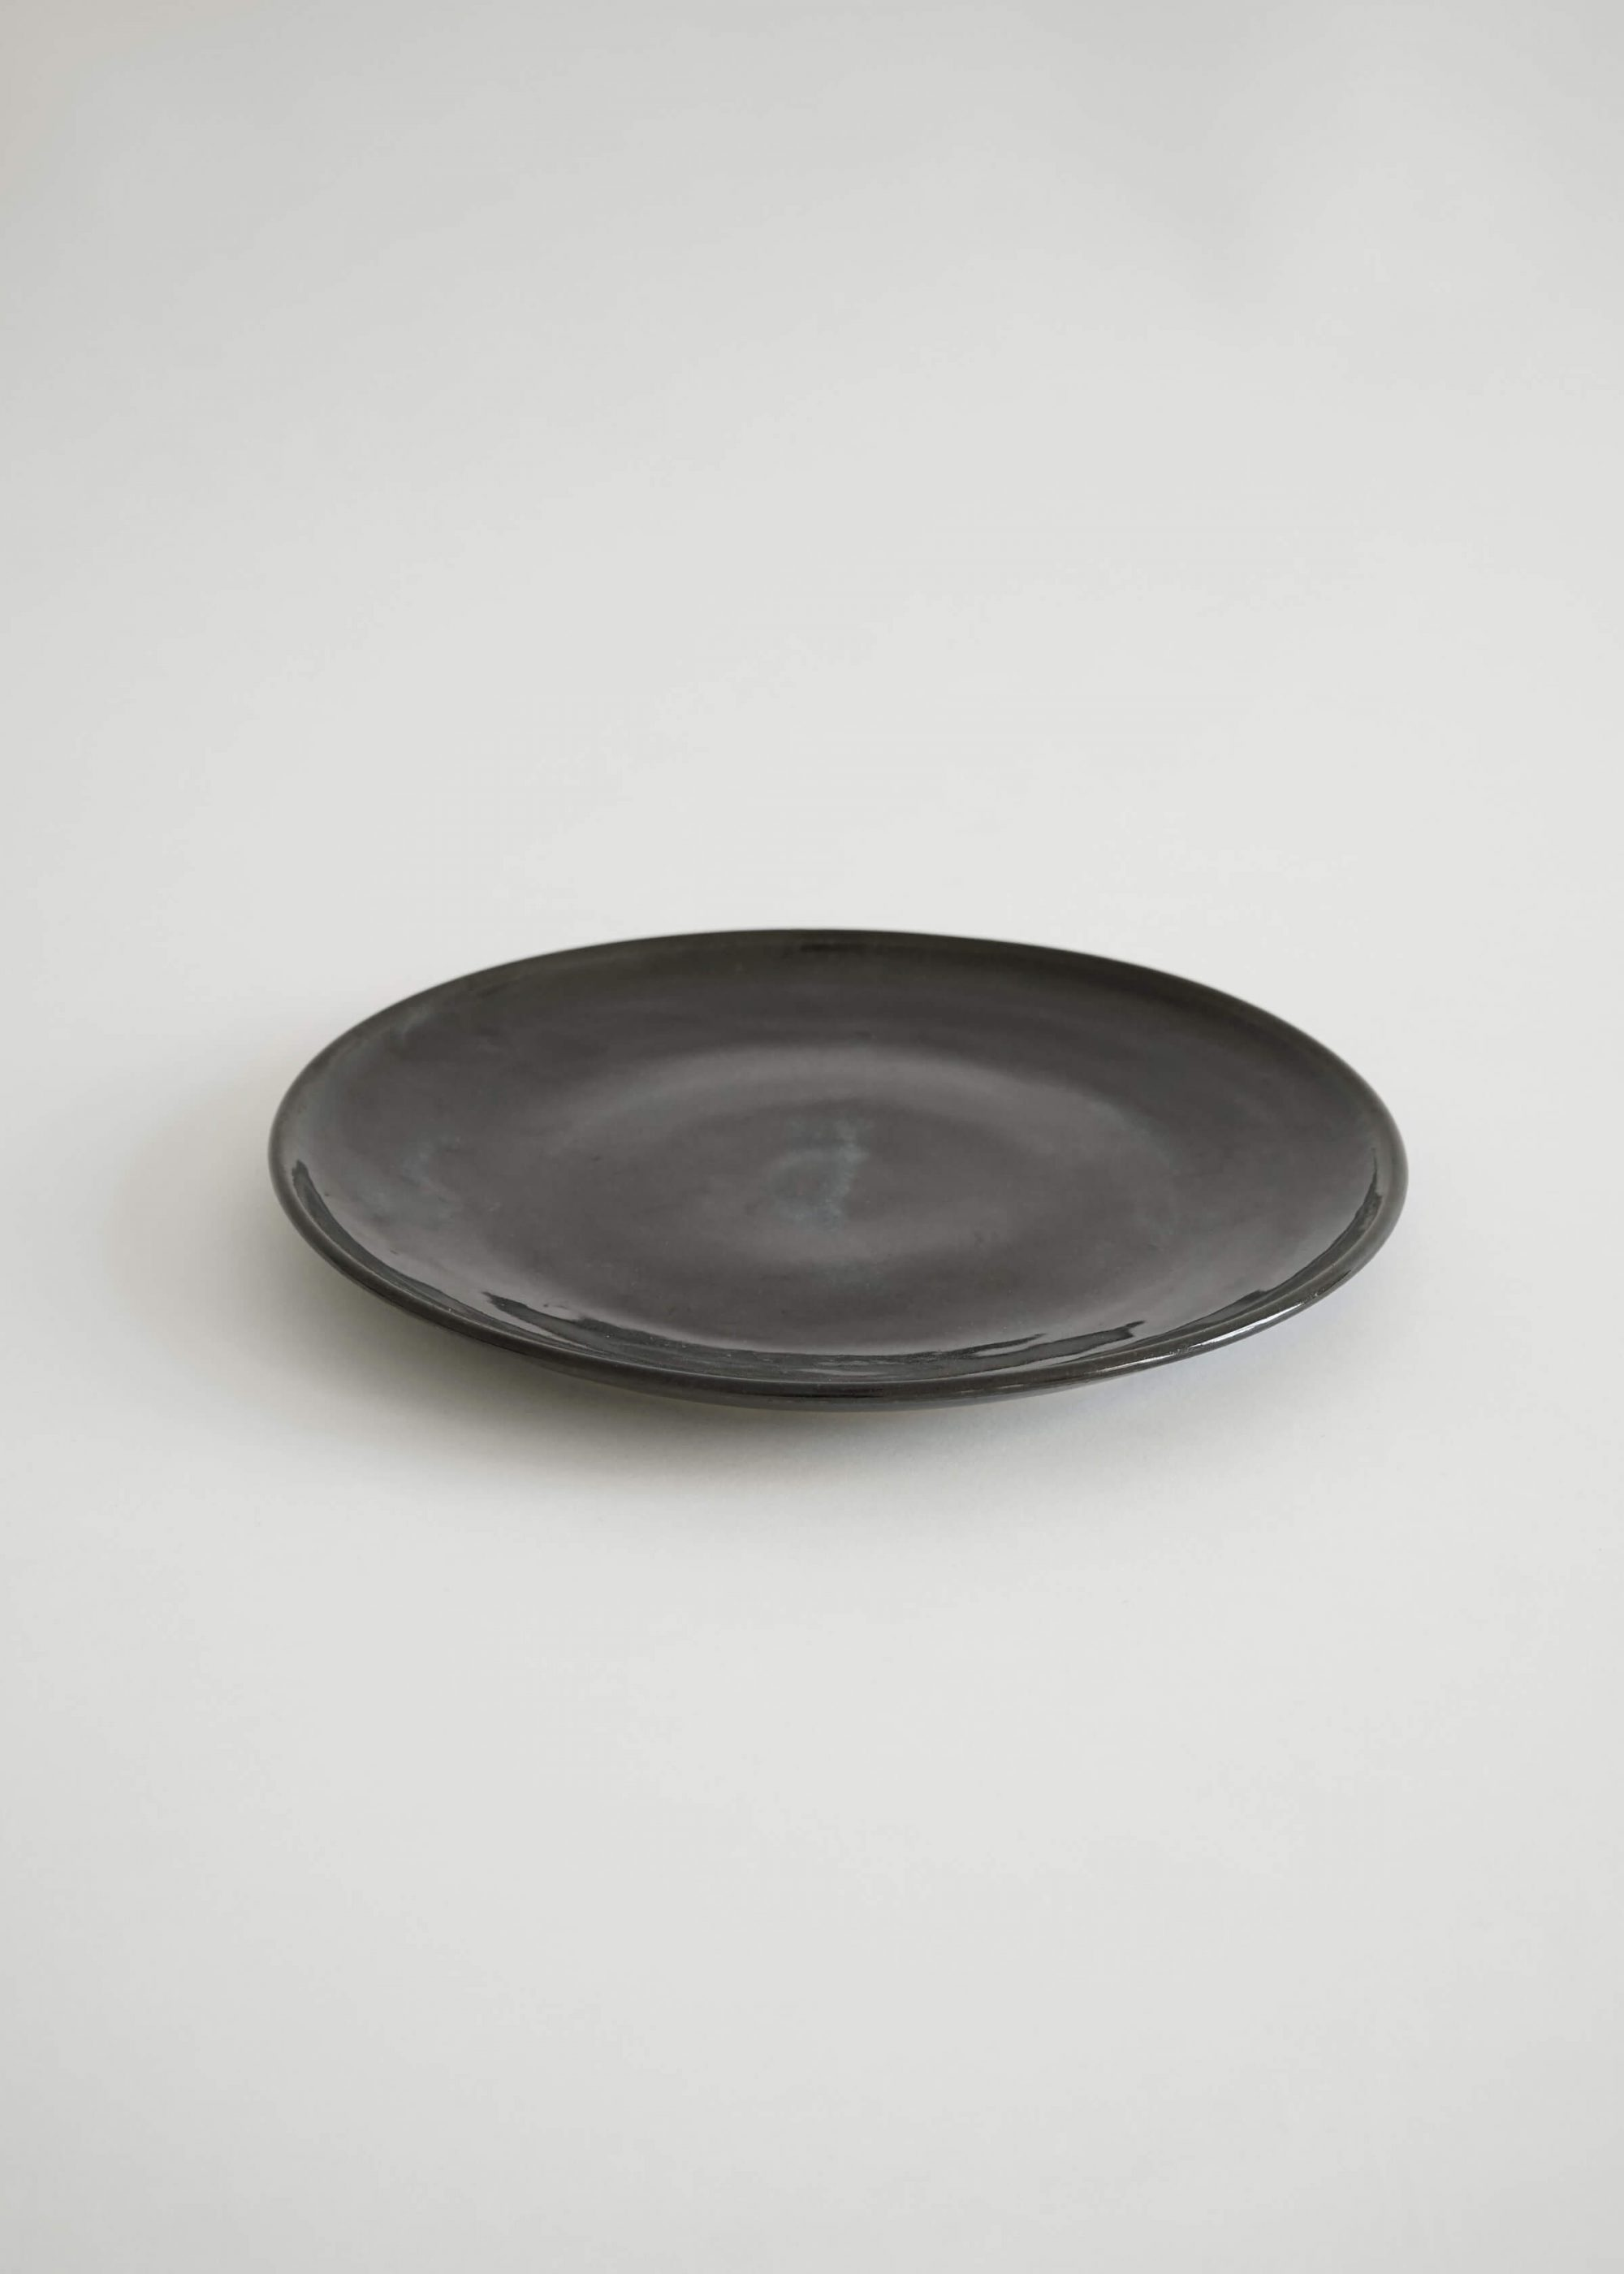 Product image for N° ICC2 Burri L